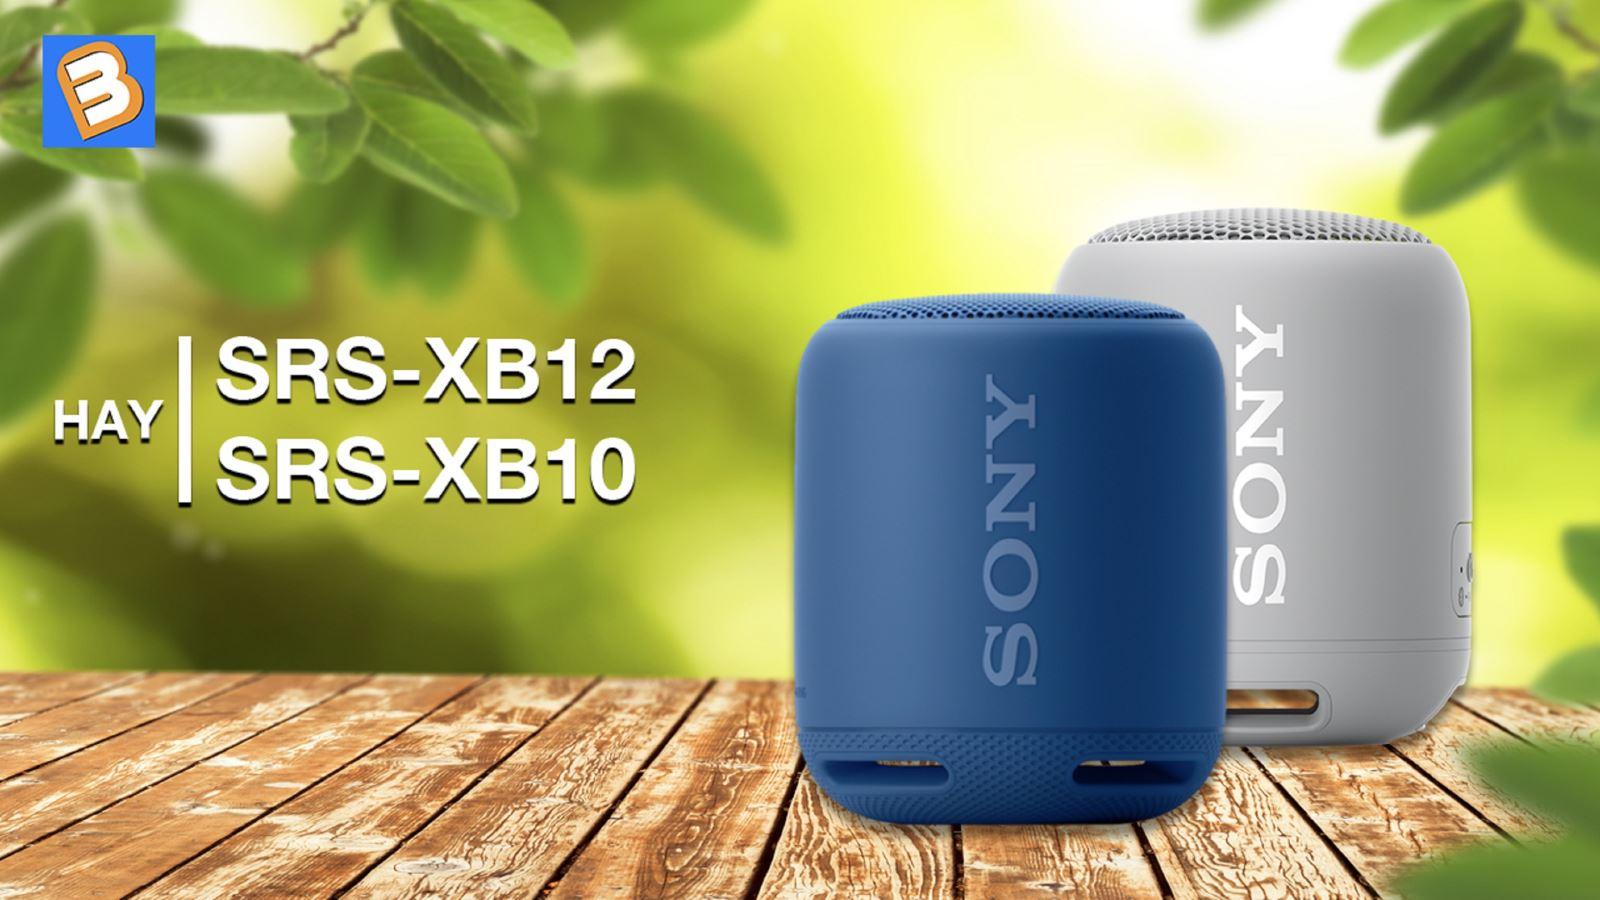 Chọn loa Sony SRS-XB12 haySRS-XB10